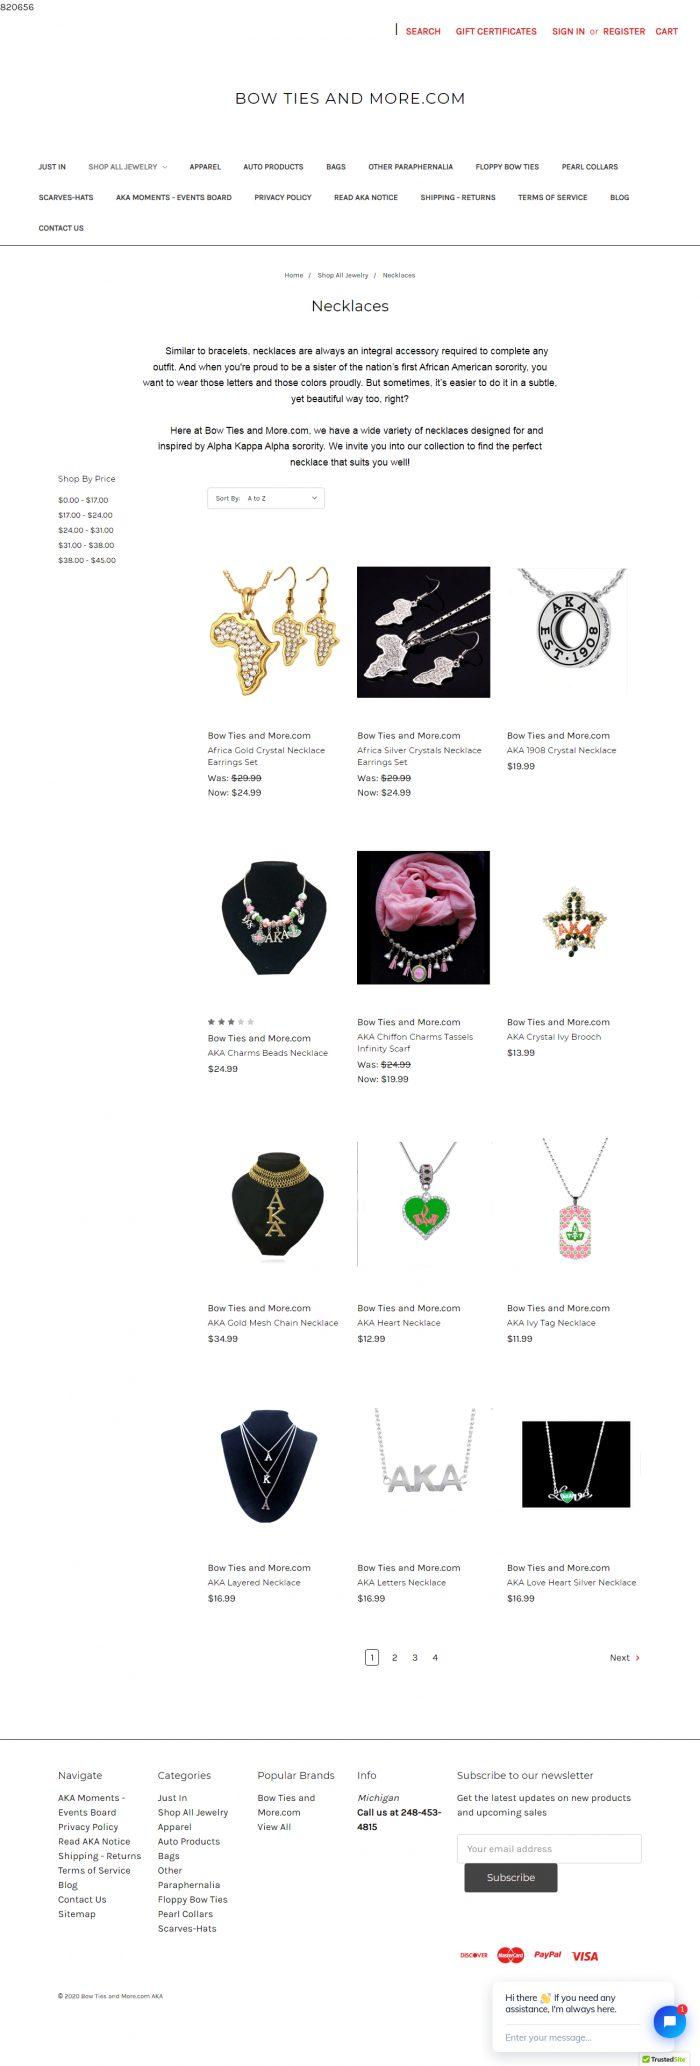 aka Necklaces